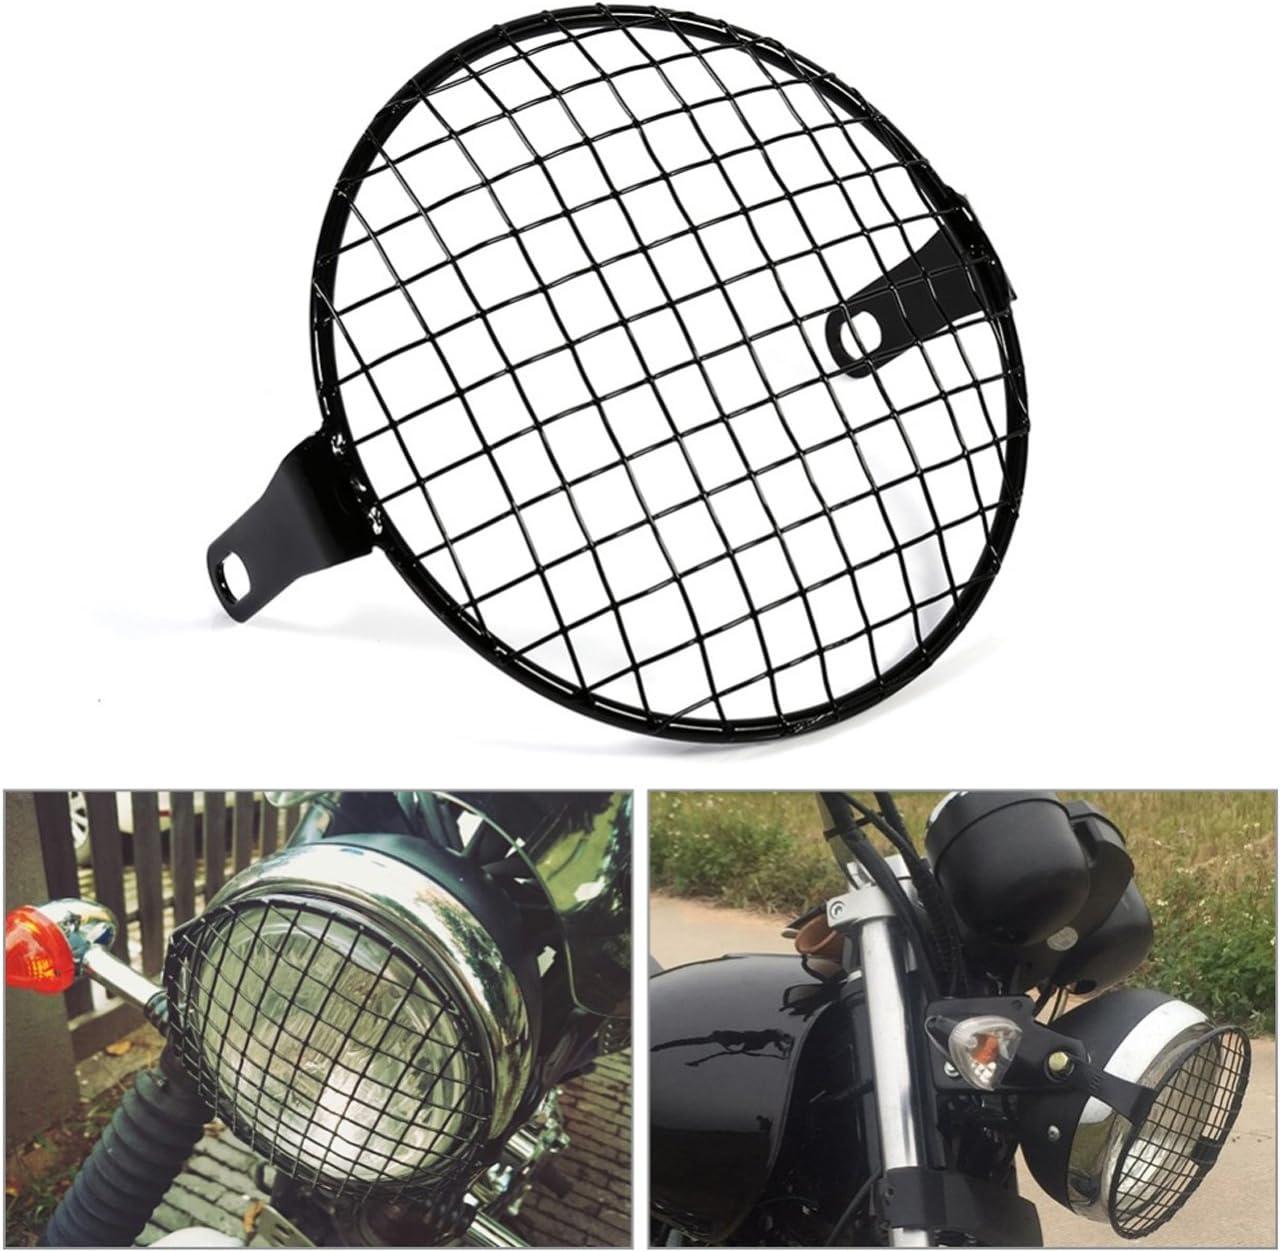 NATGIC Metal Motorcycle Headlight Grill Universal 7 Headlight fit 8mm-10mm side mount Screw